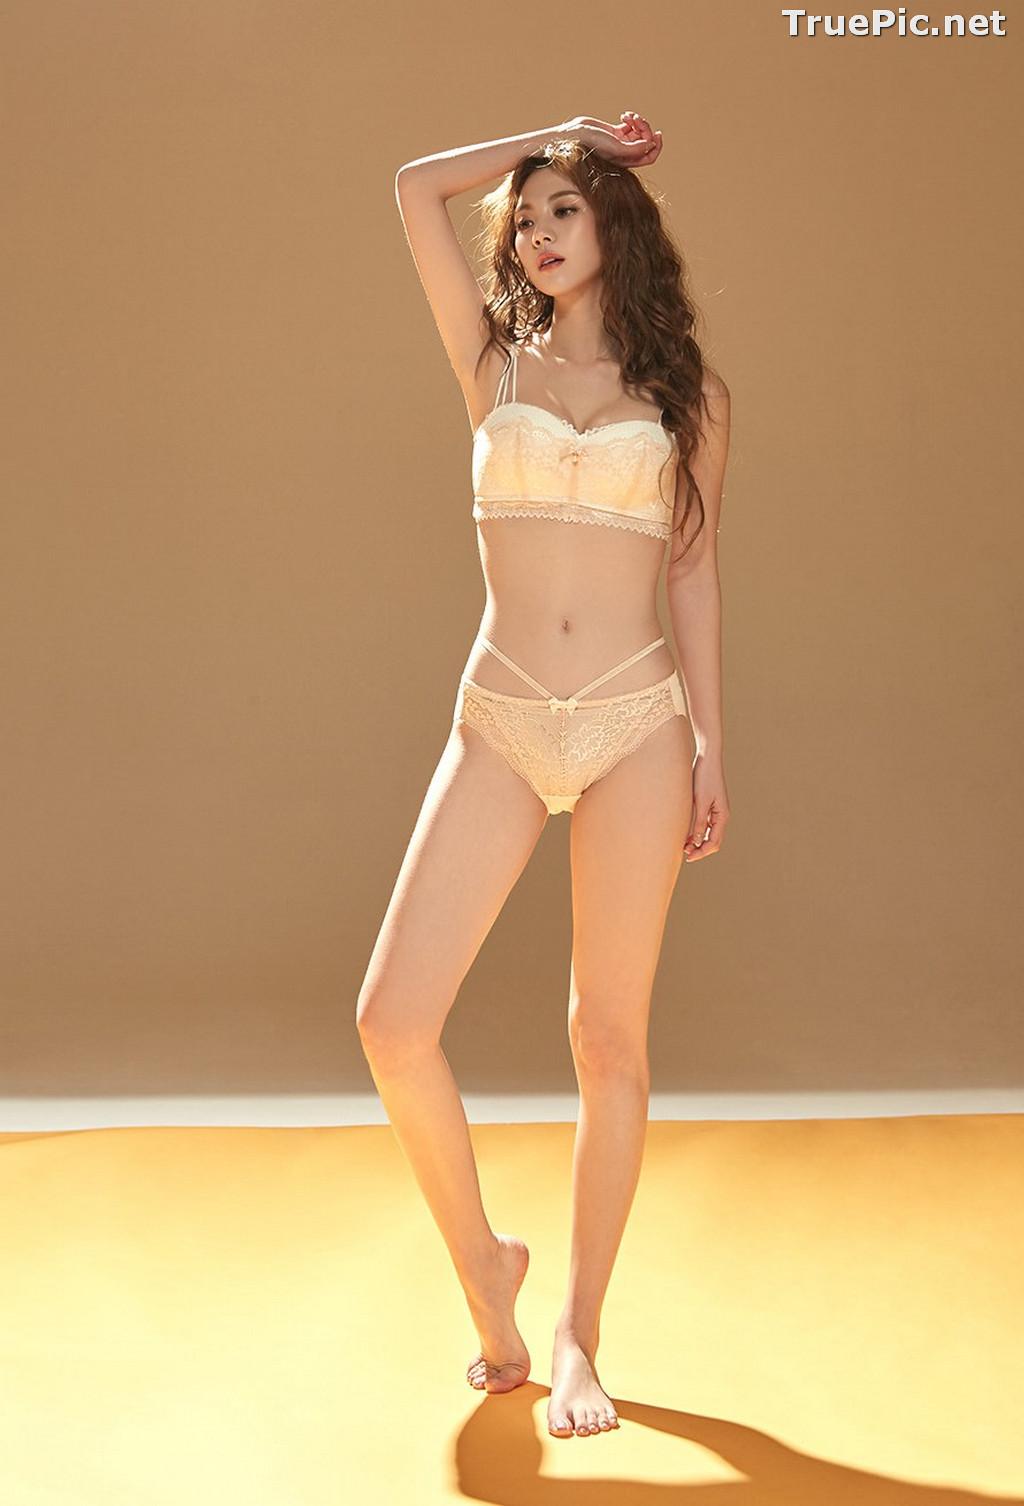 Image Korean Fashion Model – Lee Chae Eun (이채은) – Come On Vincent Lingerie #7 - TruePic.net - Picture-9